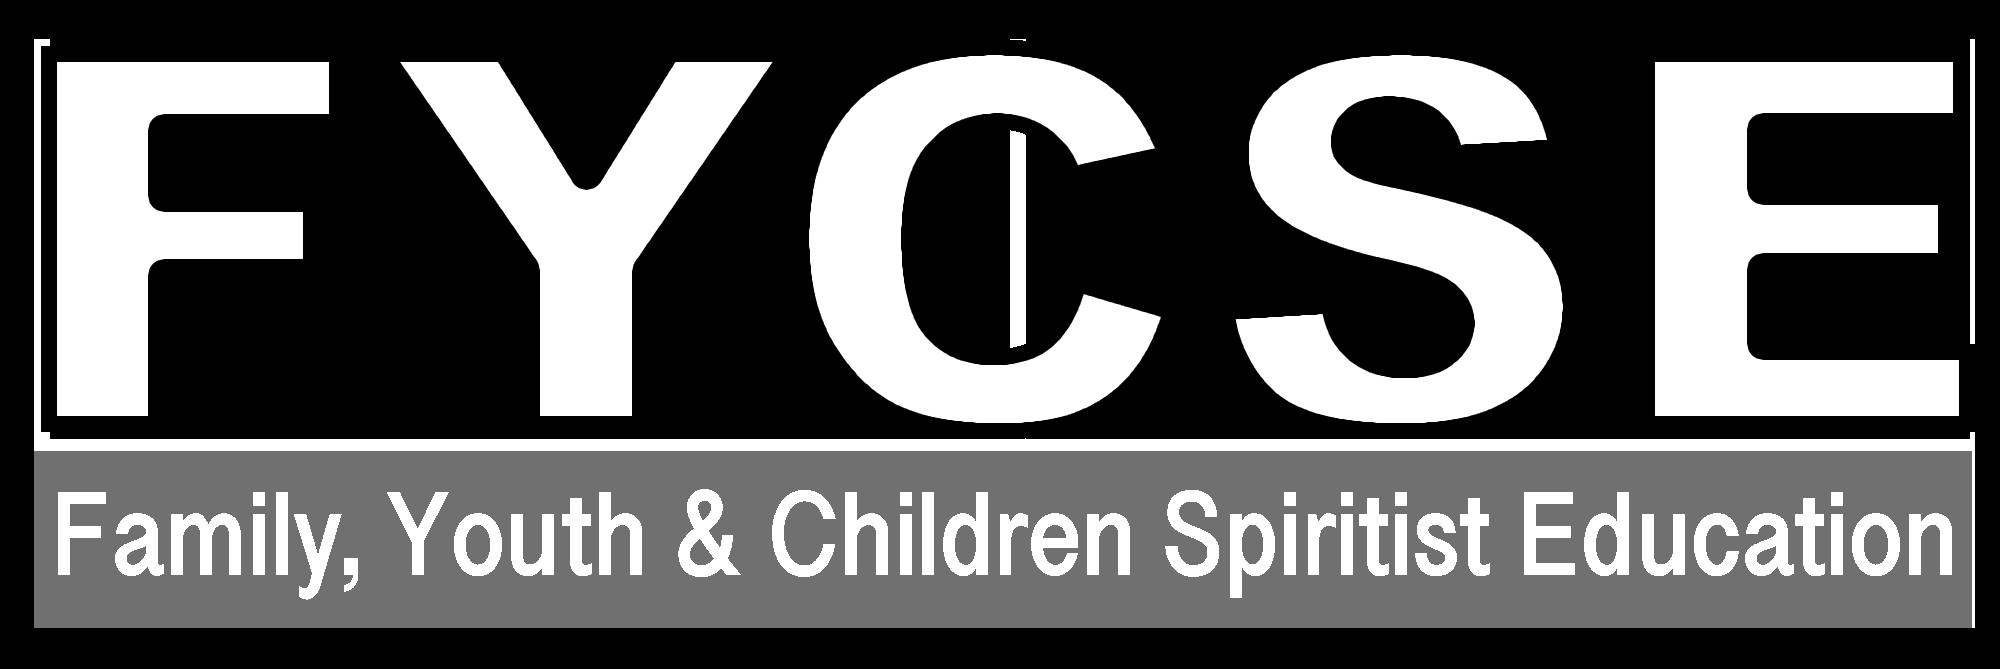 Family Youth & Children Spiritist Education